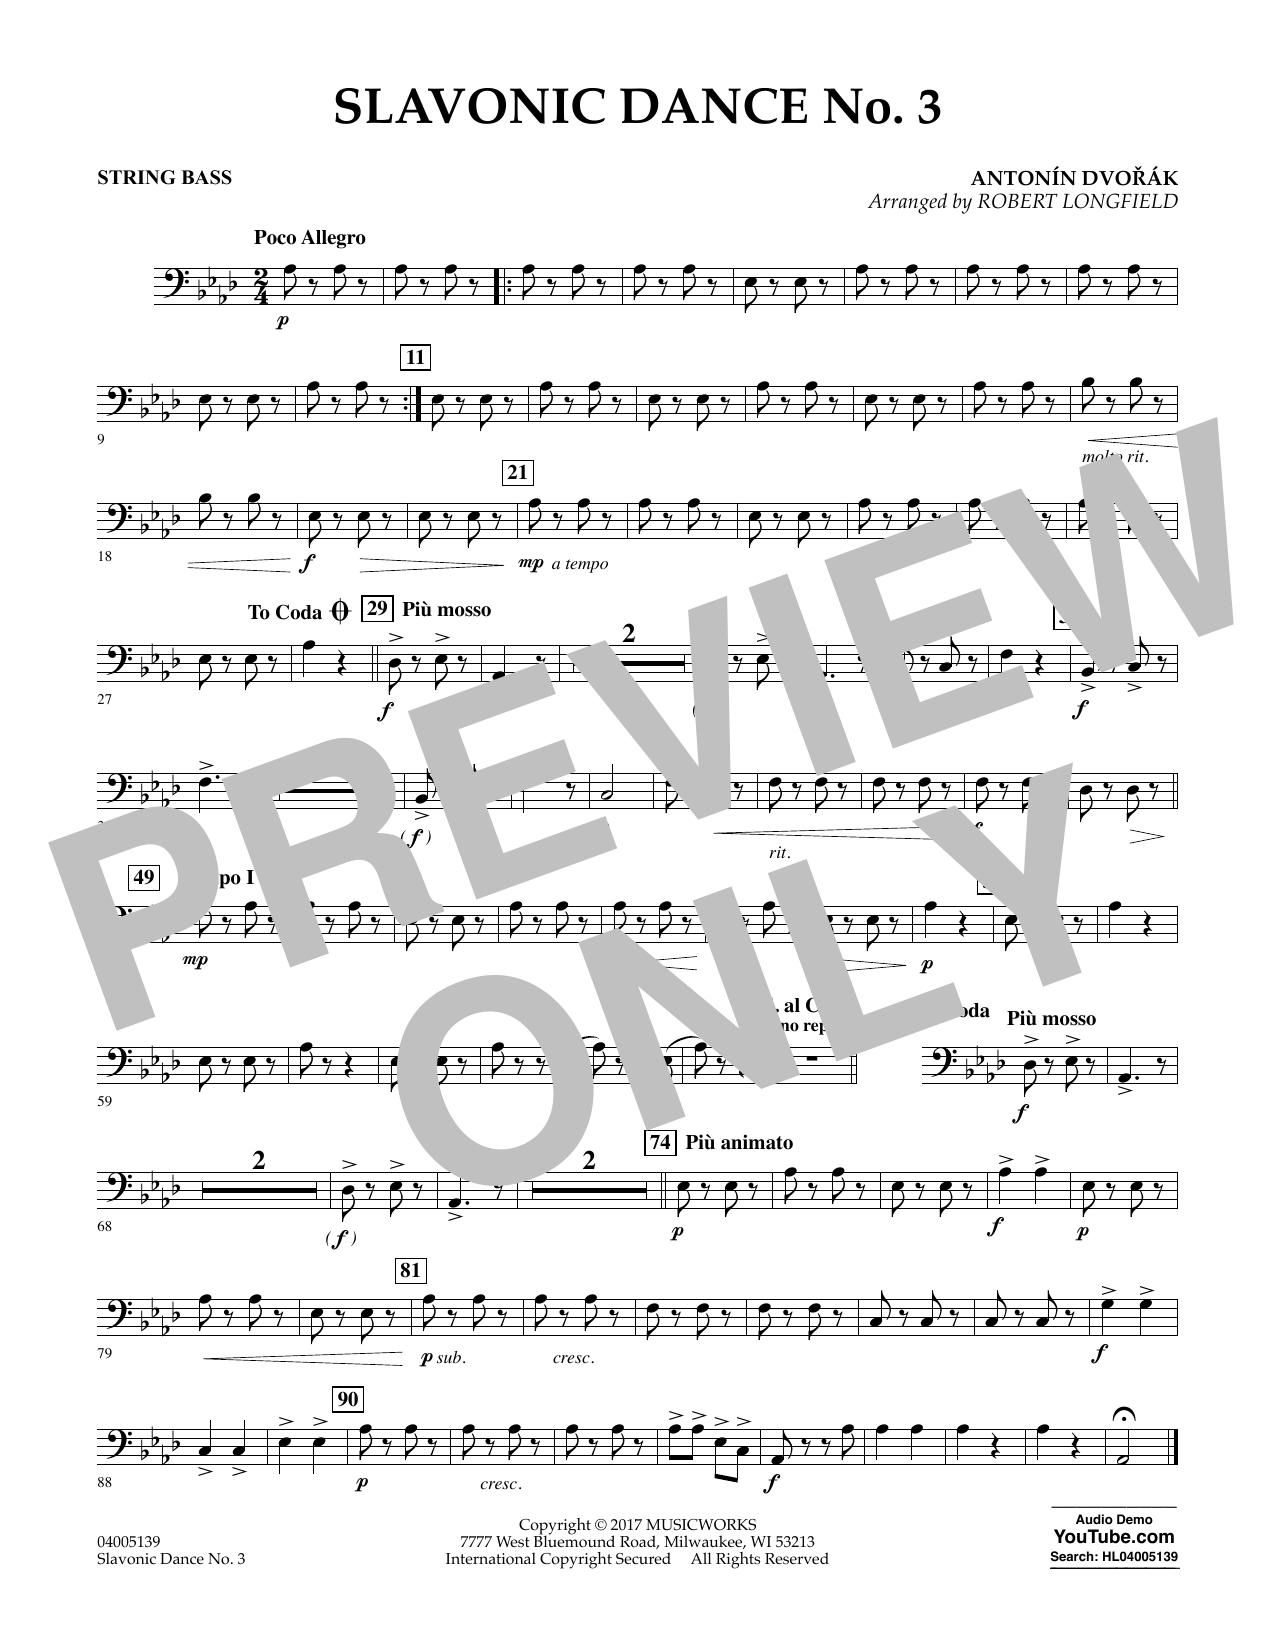 Slavonic Dance No. 3 - String Bass Sheet Music